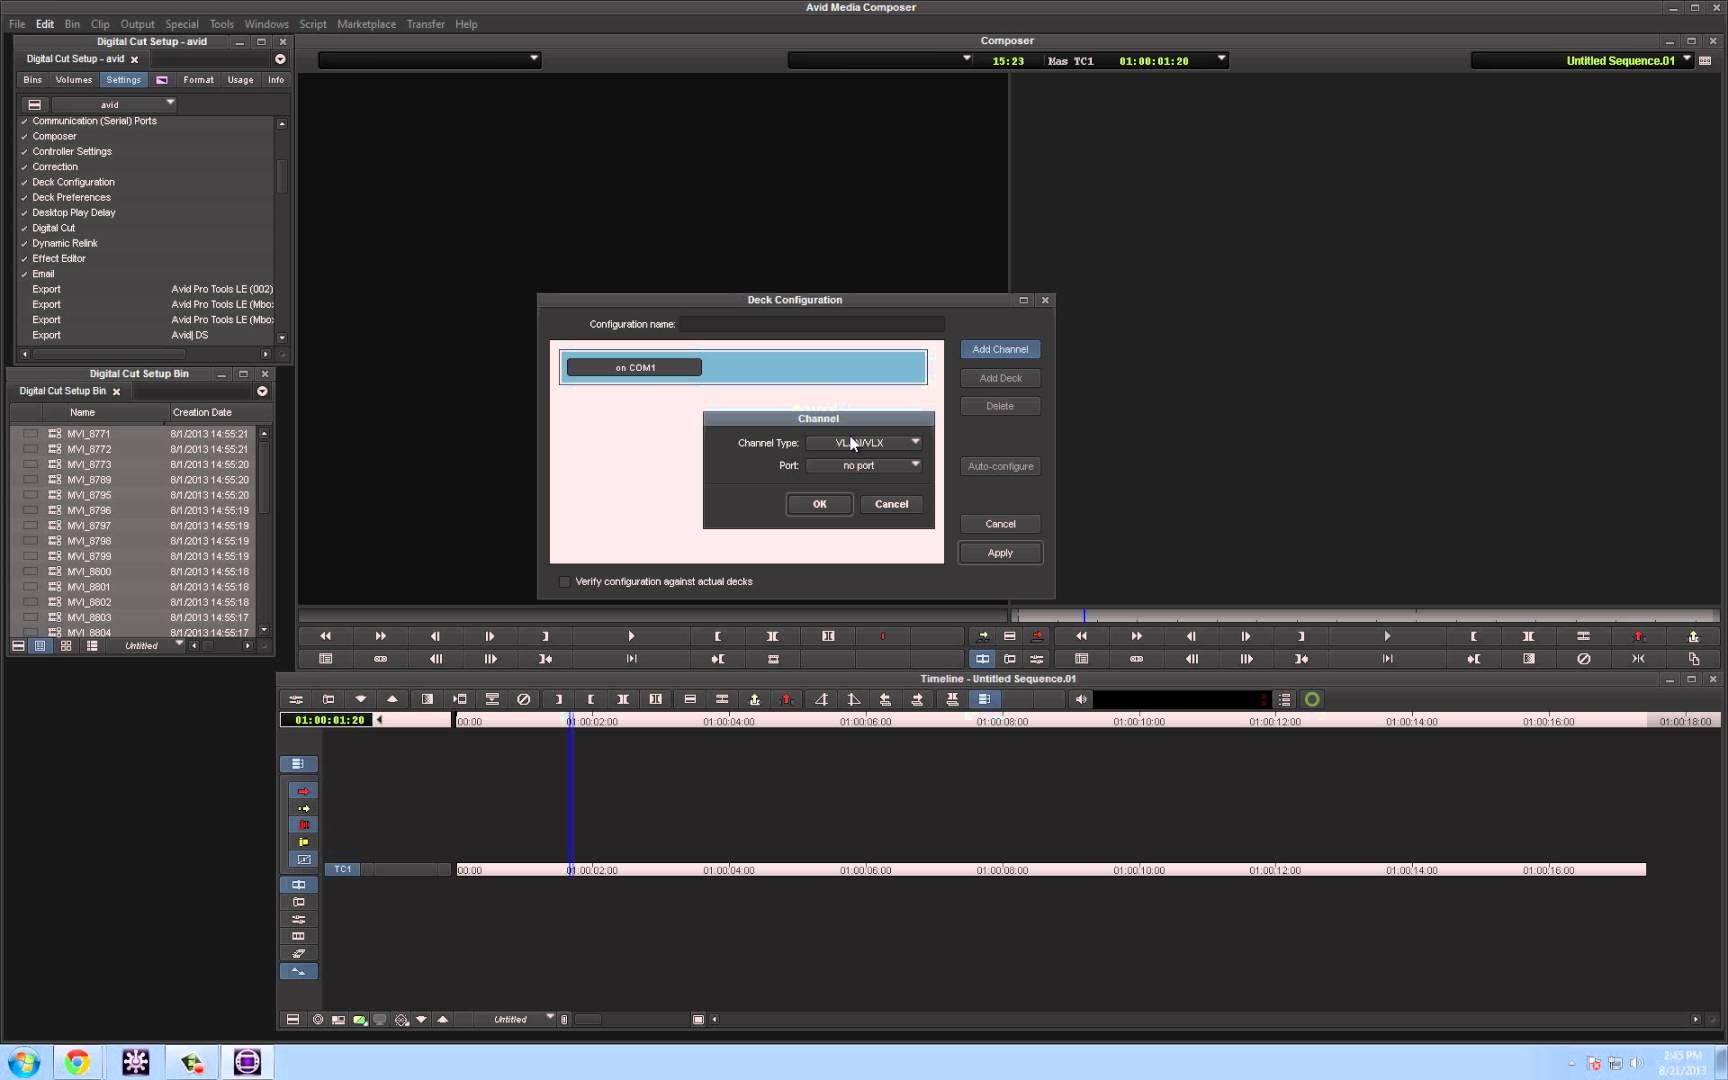 Survival Guide ‒ Media Composer® Deck Configuration ‒ Avid®